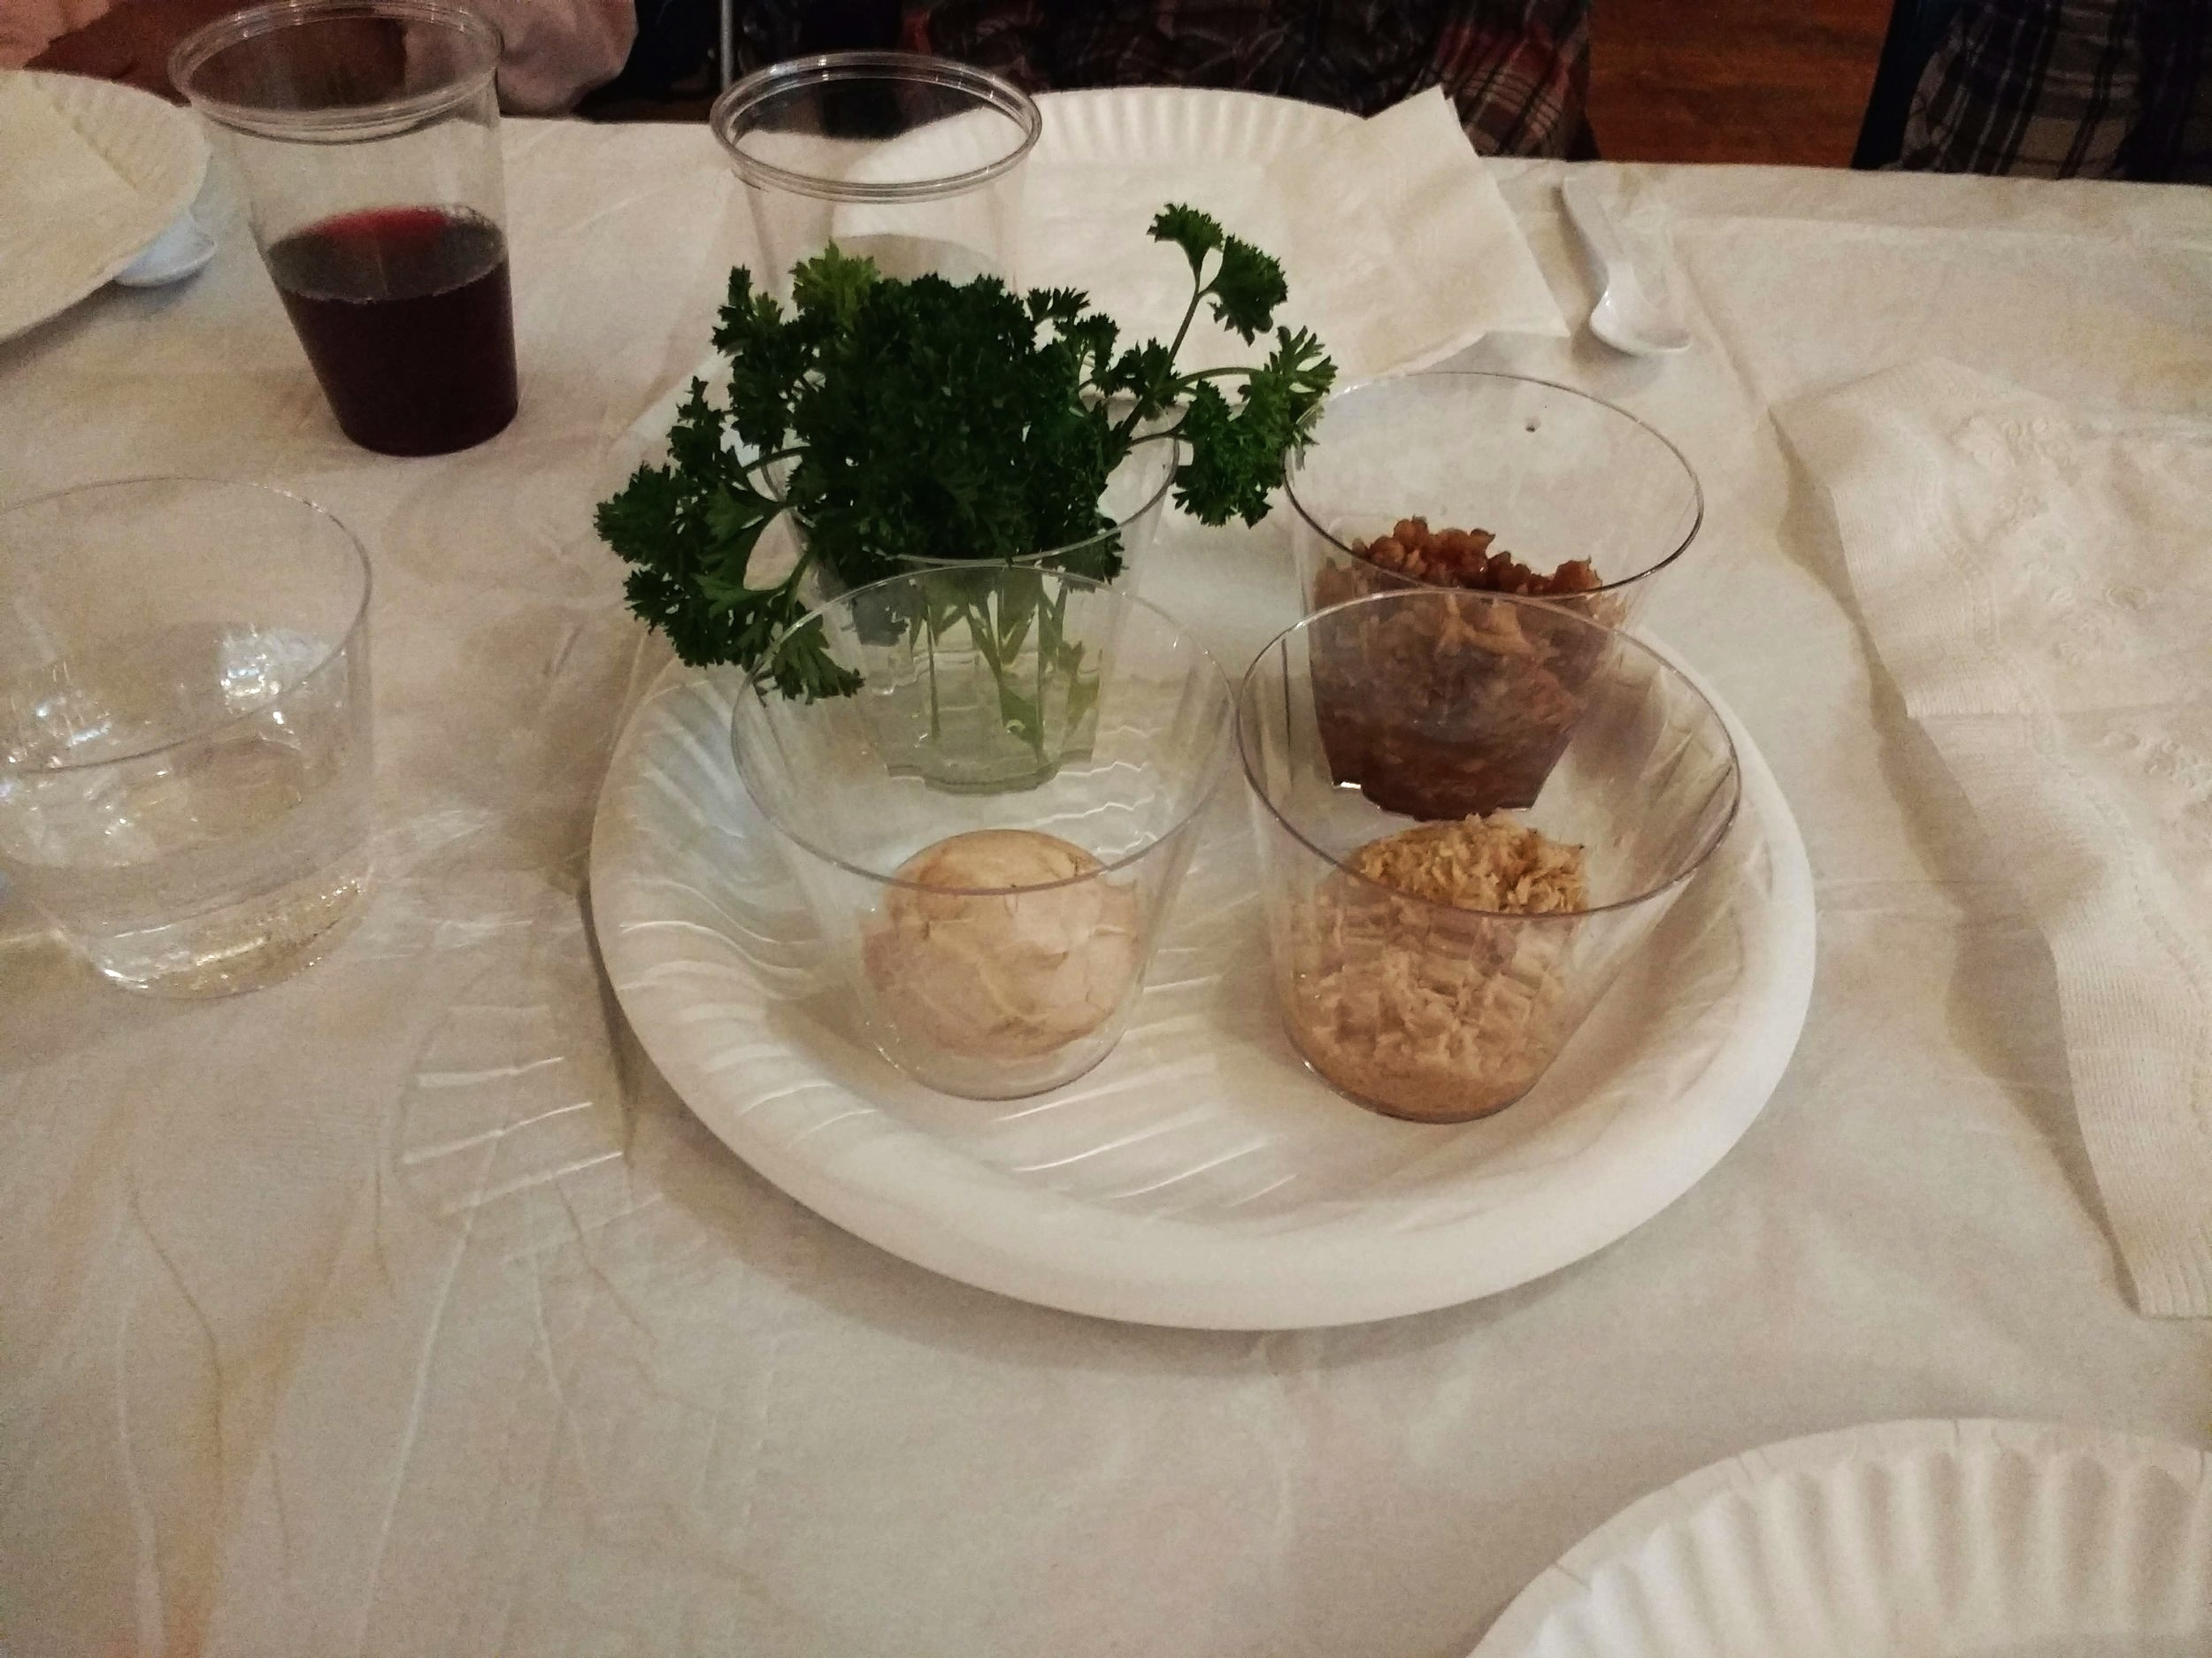 Passover seder elements